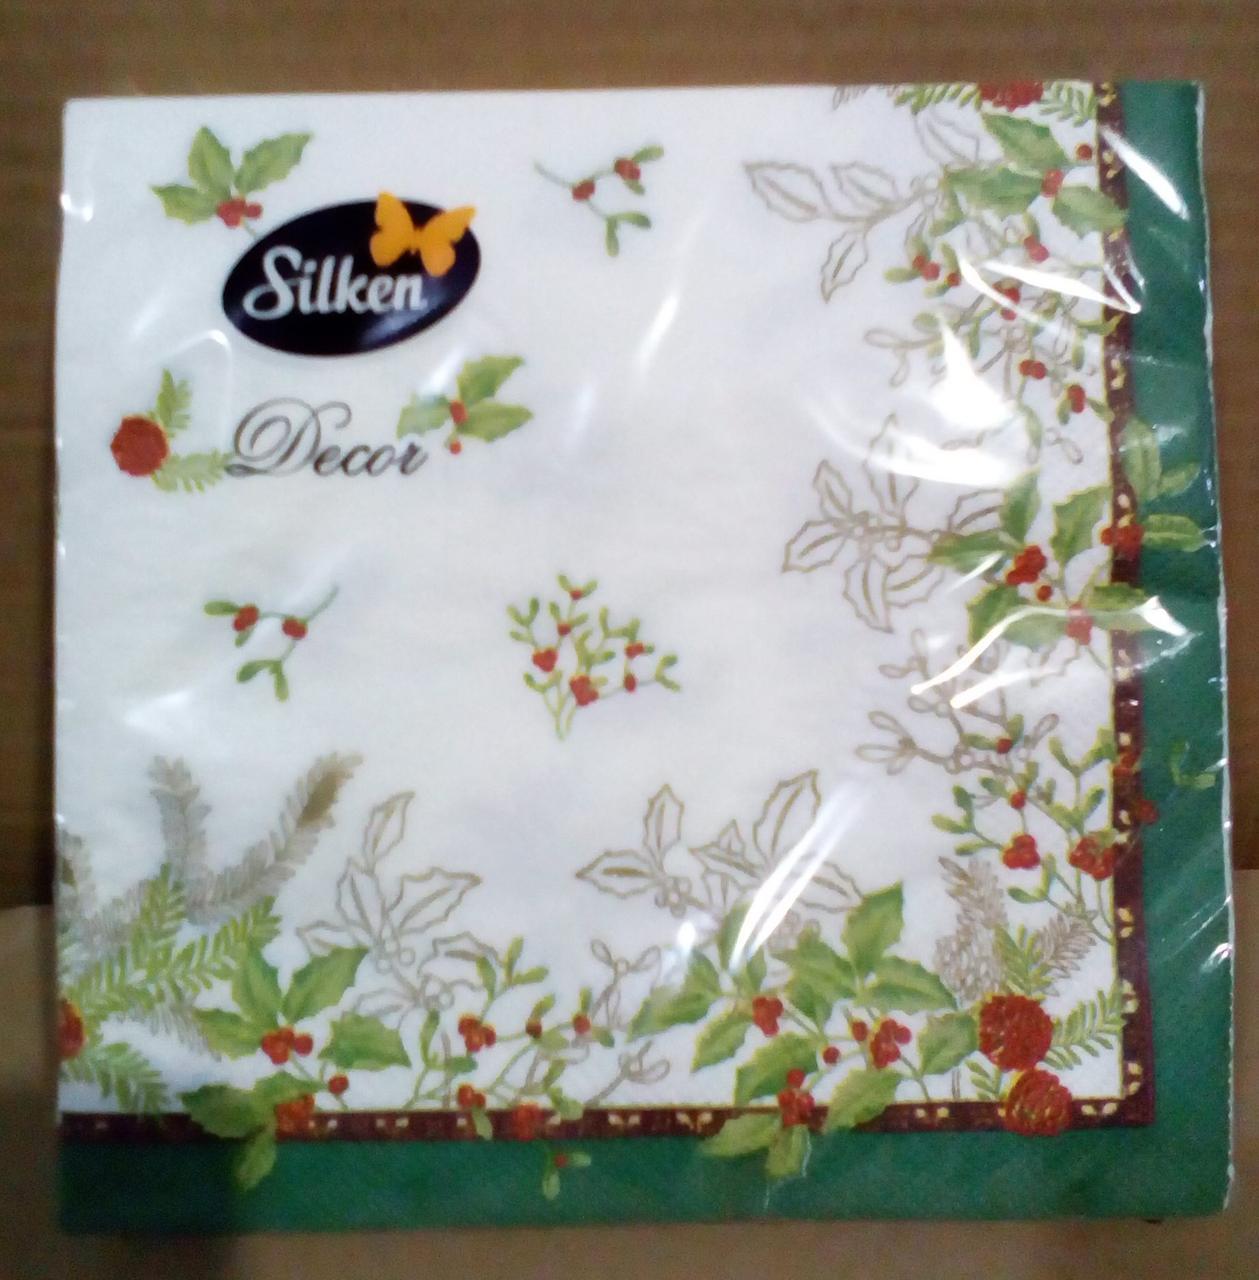 "Салфетка Silken 3-сл, ""Ніжність"" с печатью 20шт 33*33см"